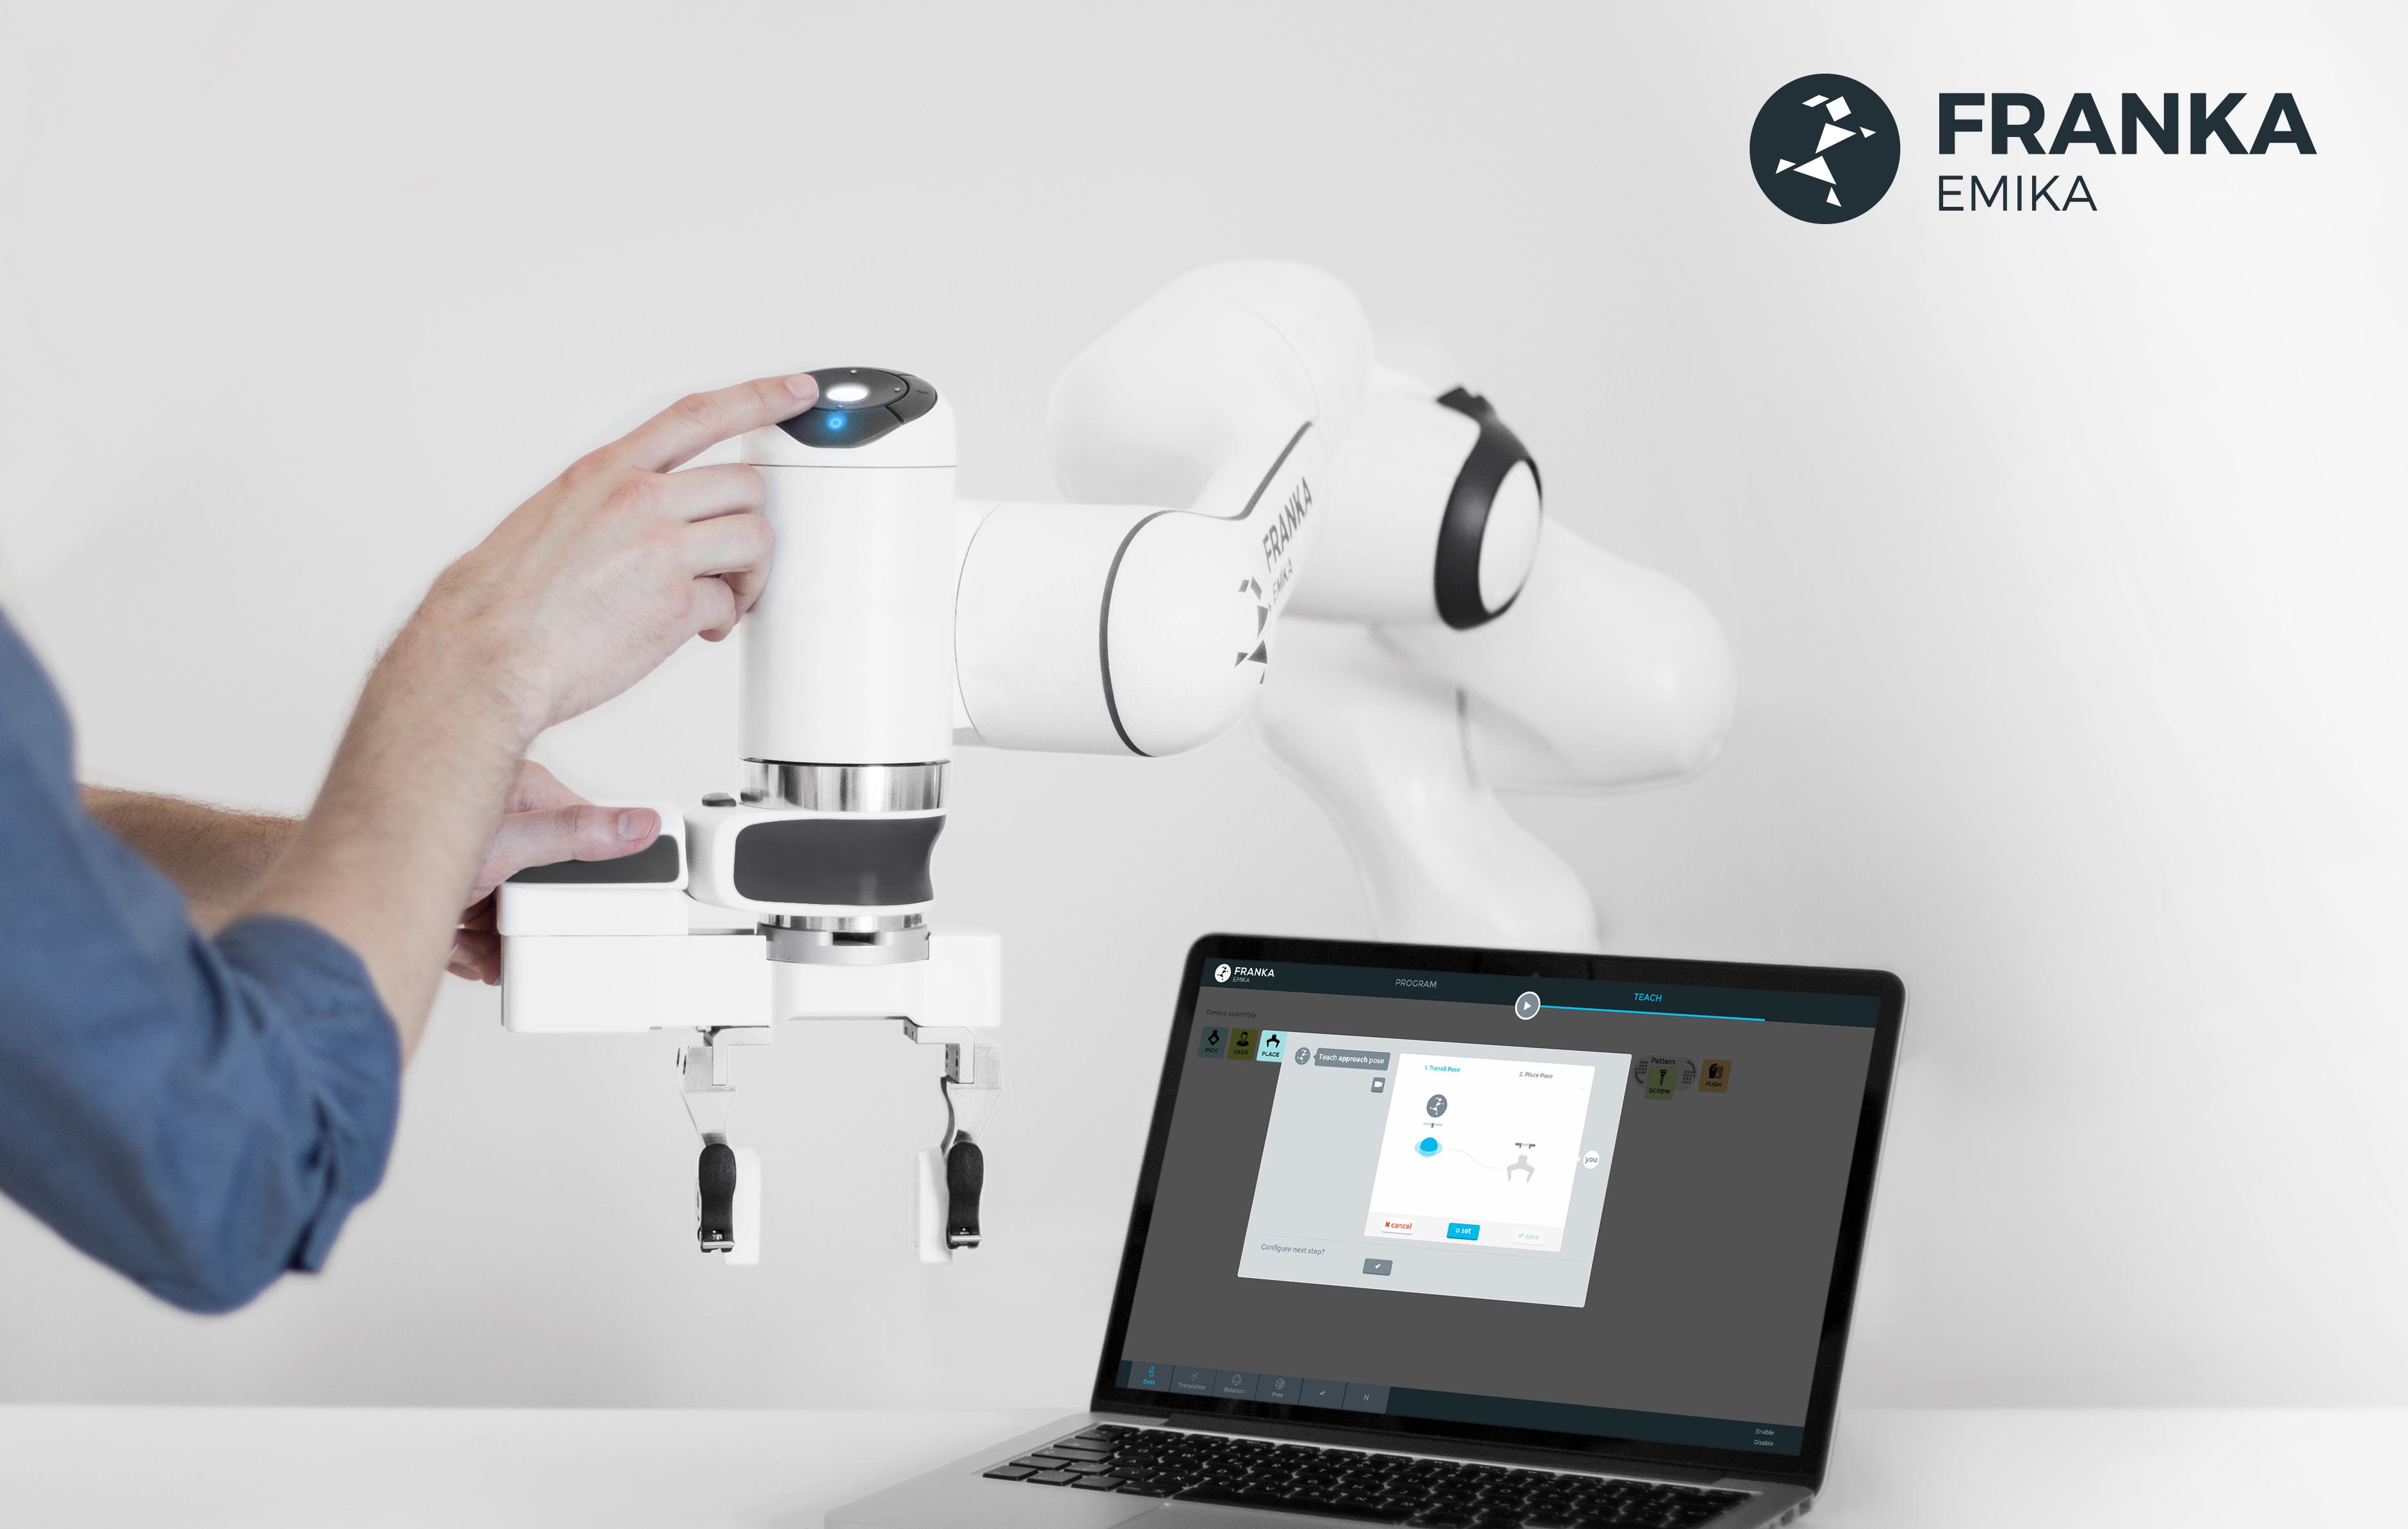 franka emika  everybody u2019s robot